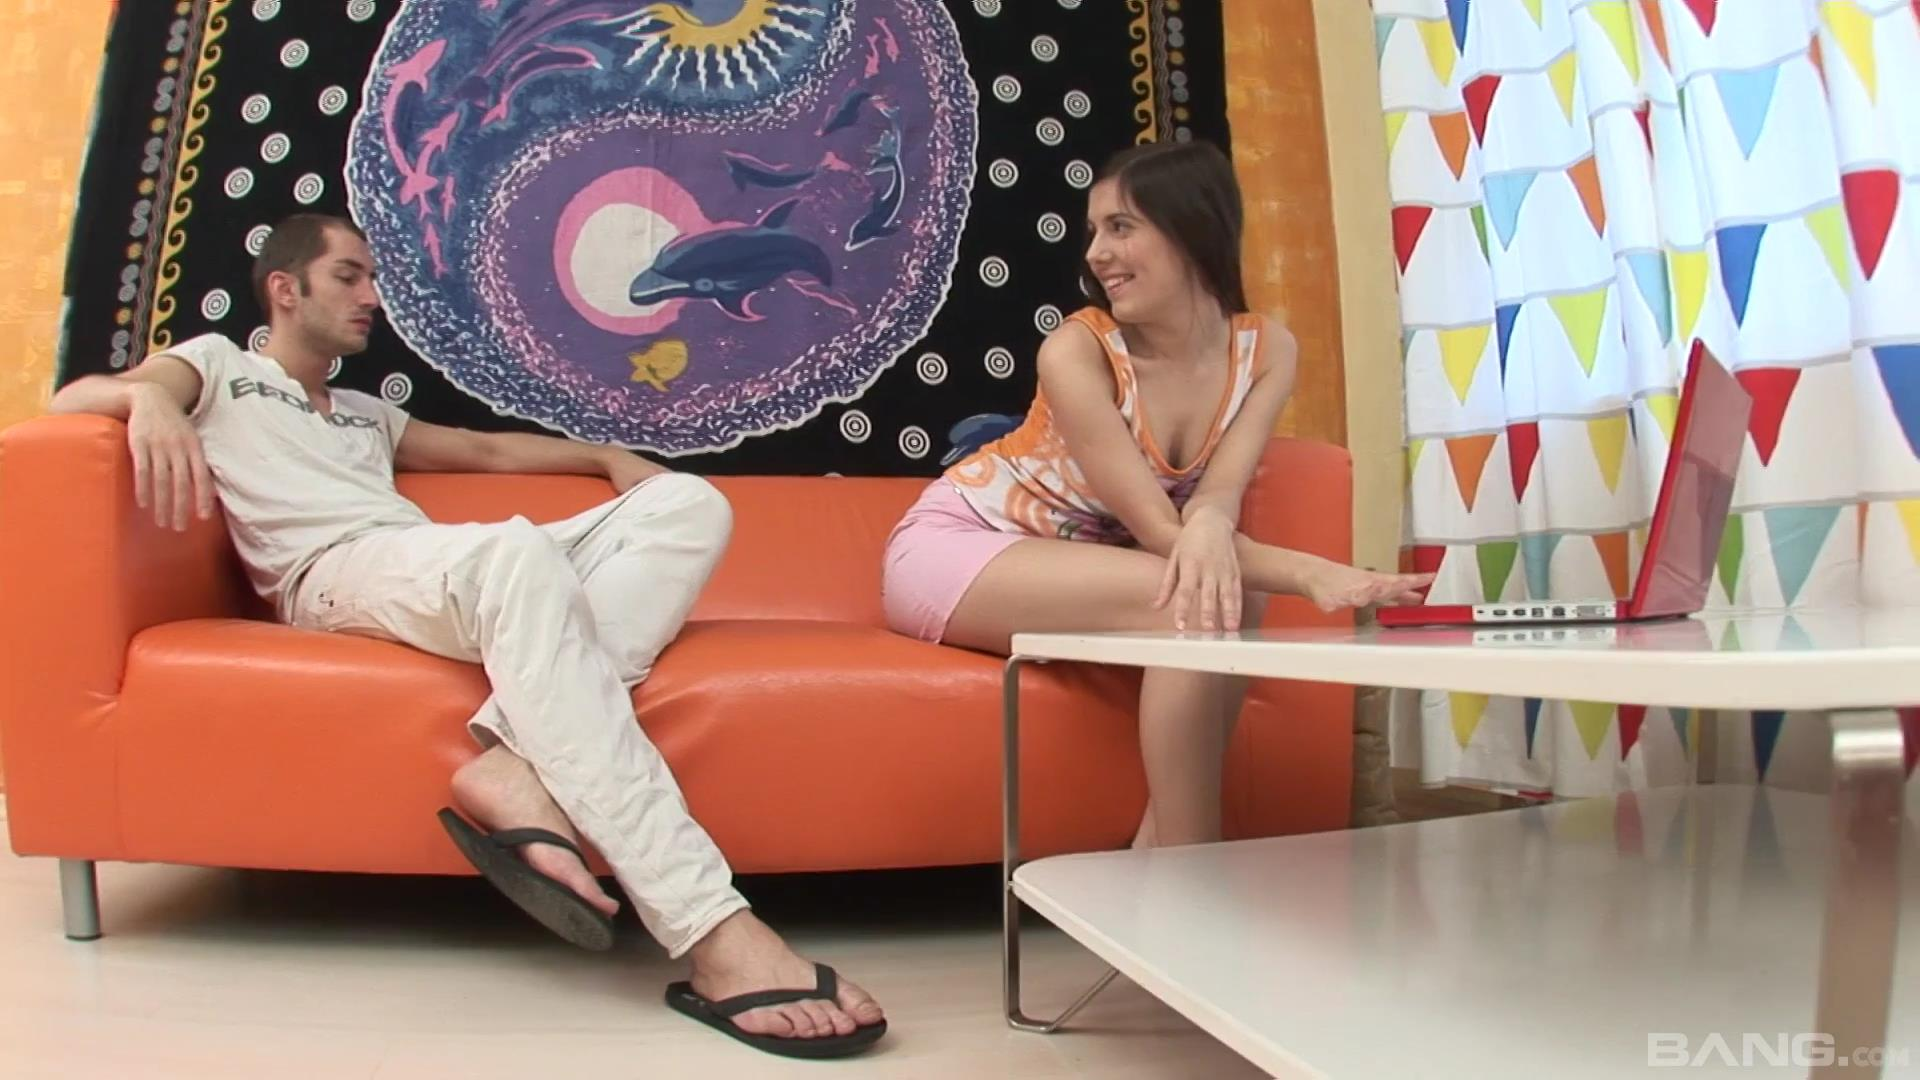 Hd Video Of A Euro Teen Getting An Anal Creampie -